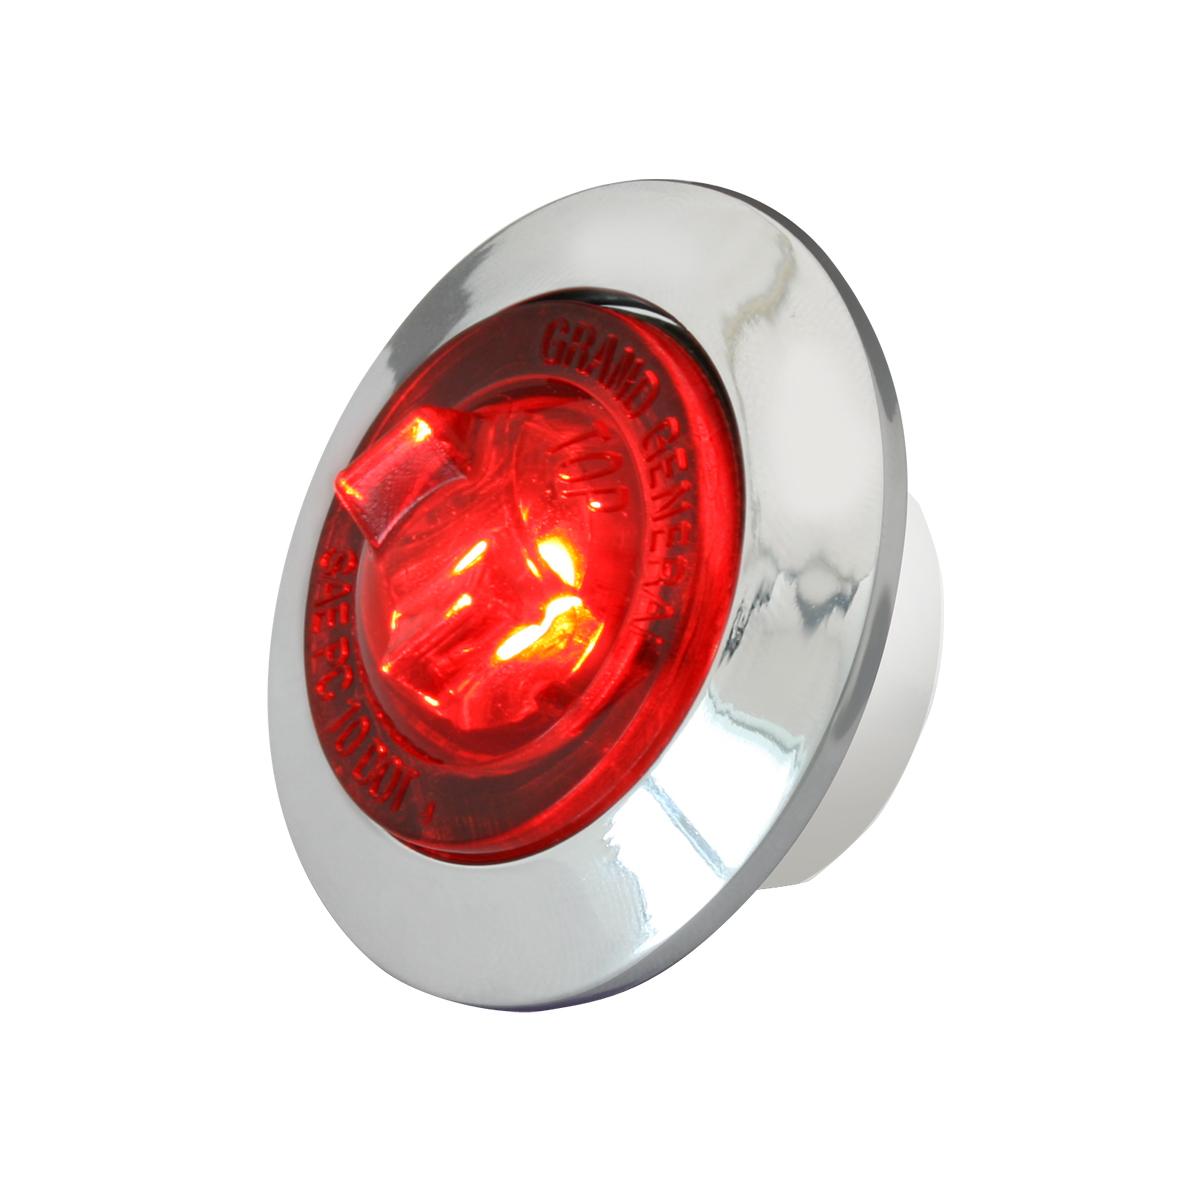 "75272 1"" Dual Function Mini Push/Screw-in Wide Angle LED Light w/ Chrome Bezel"